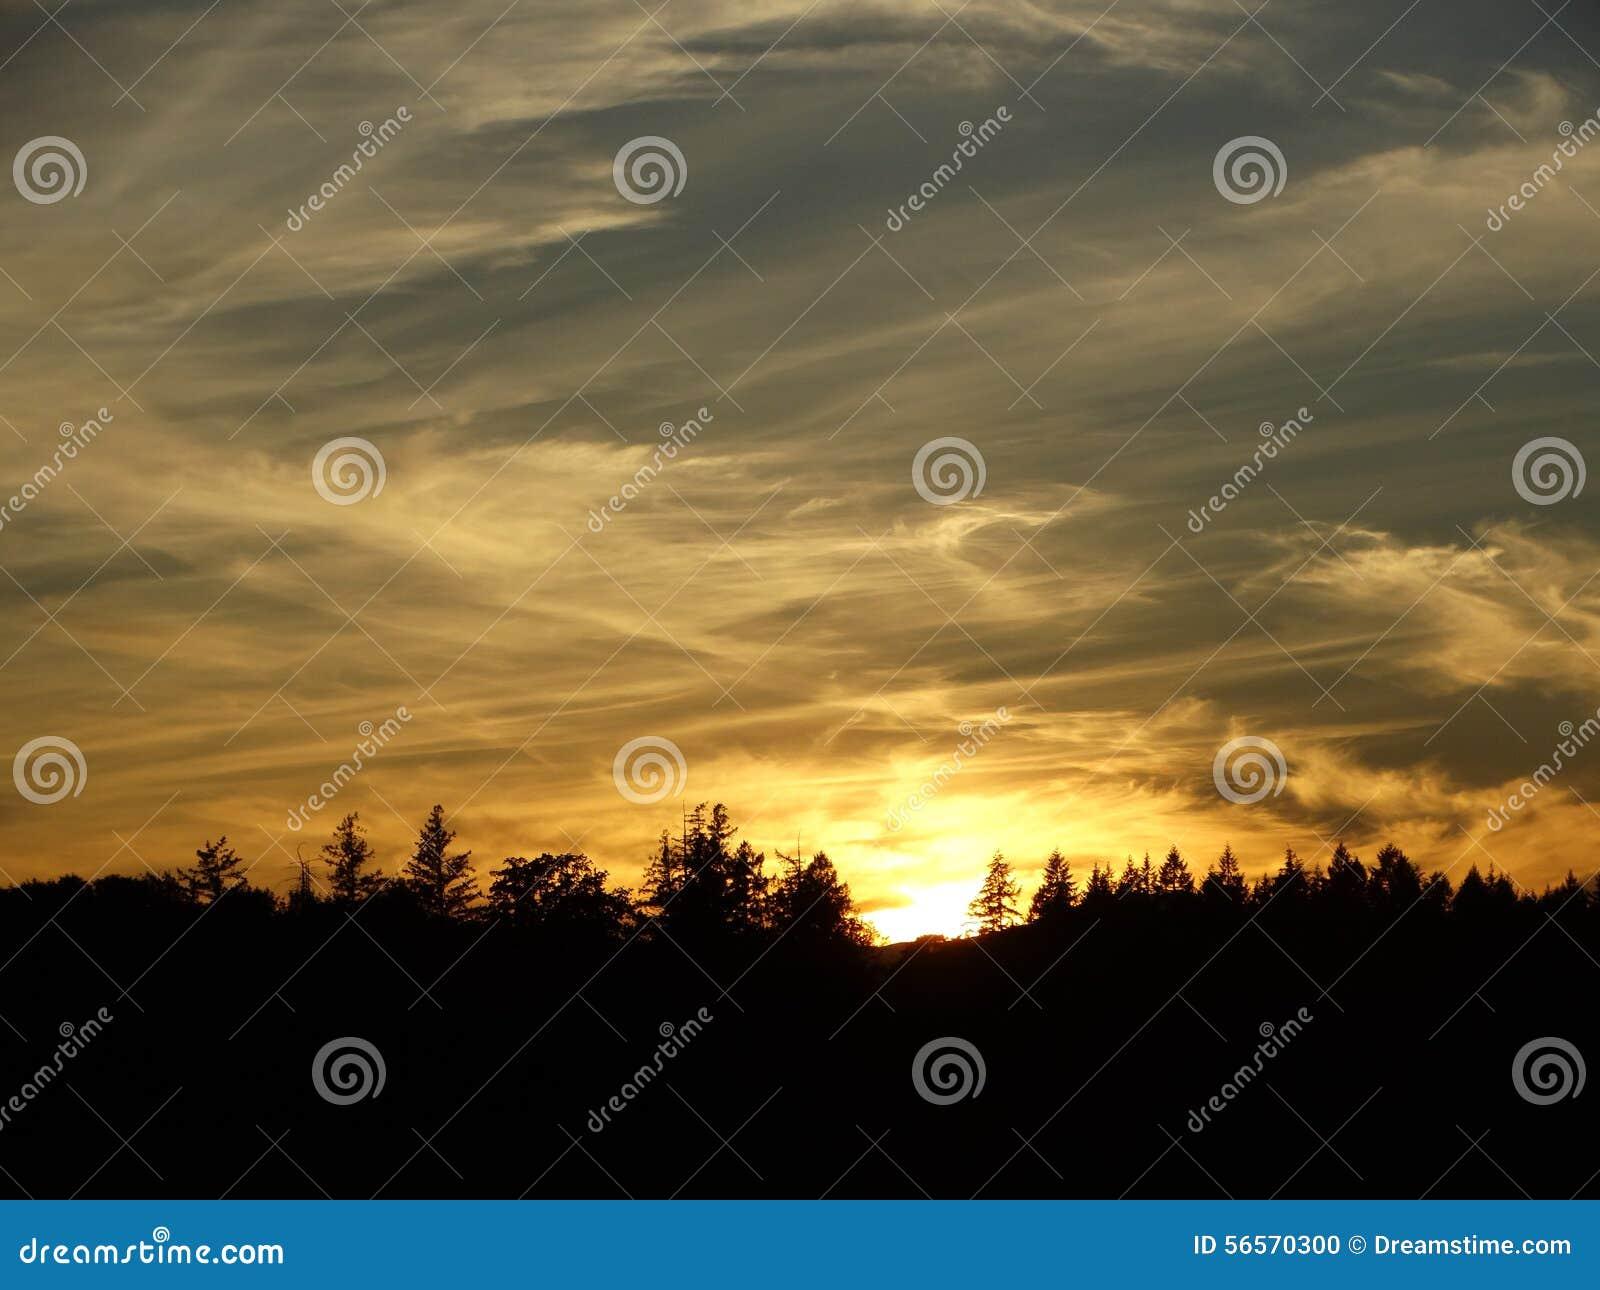 Download Μαρμάρινο σχέδιο ανατολής στοκ εικόνες. εικόνα από evergreens - 56570300